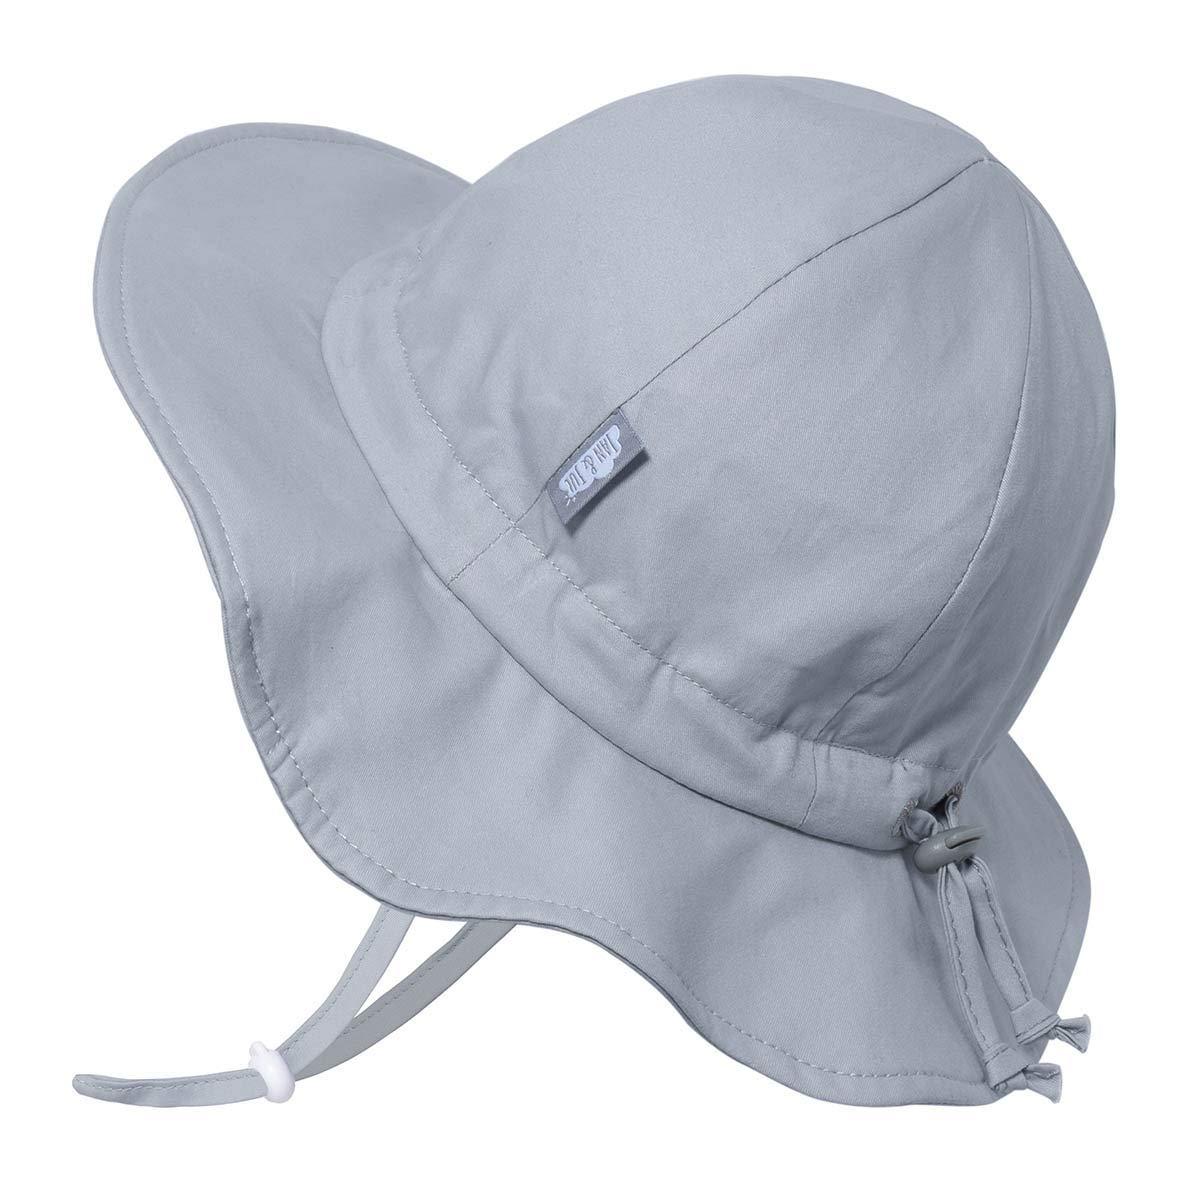 Adjustable Straps UPF 50 Jan /& Jul GRO-with-Me Aqua-Dry Sun-Hat for Baby Toddler Girls